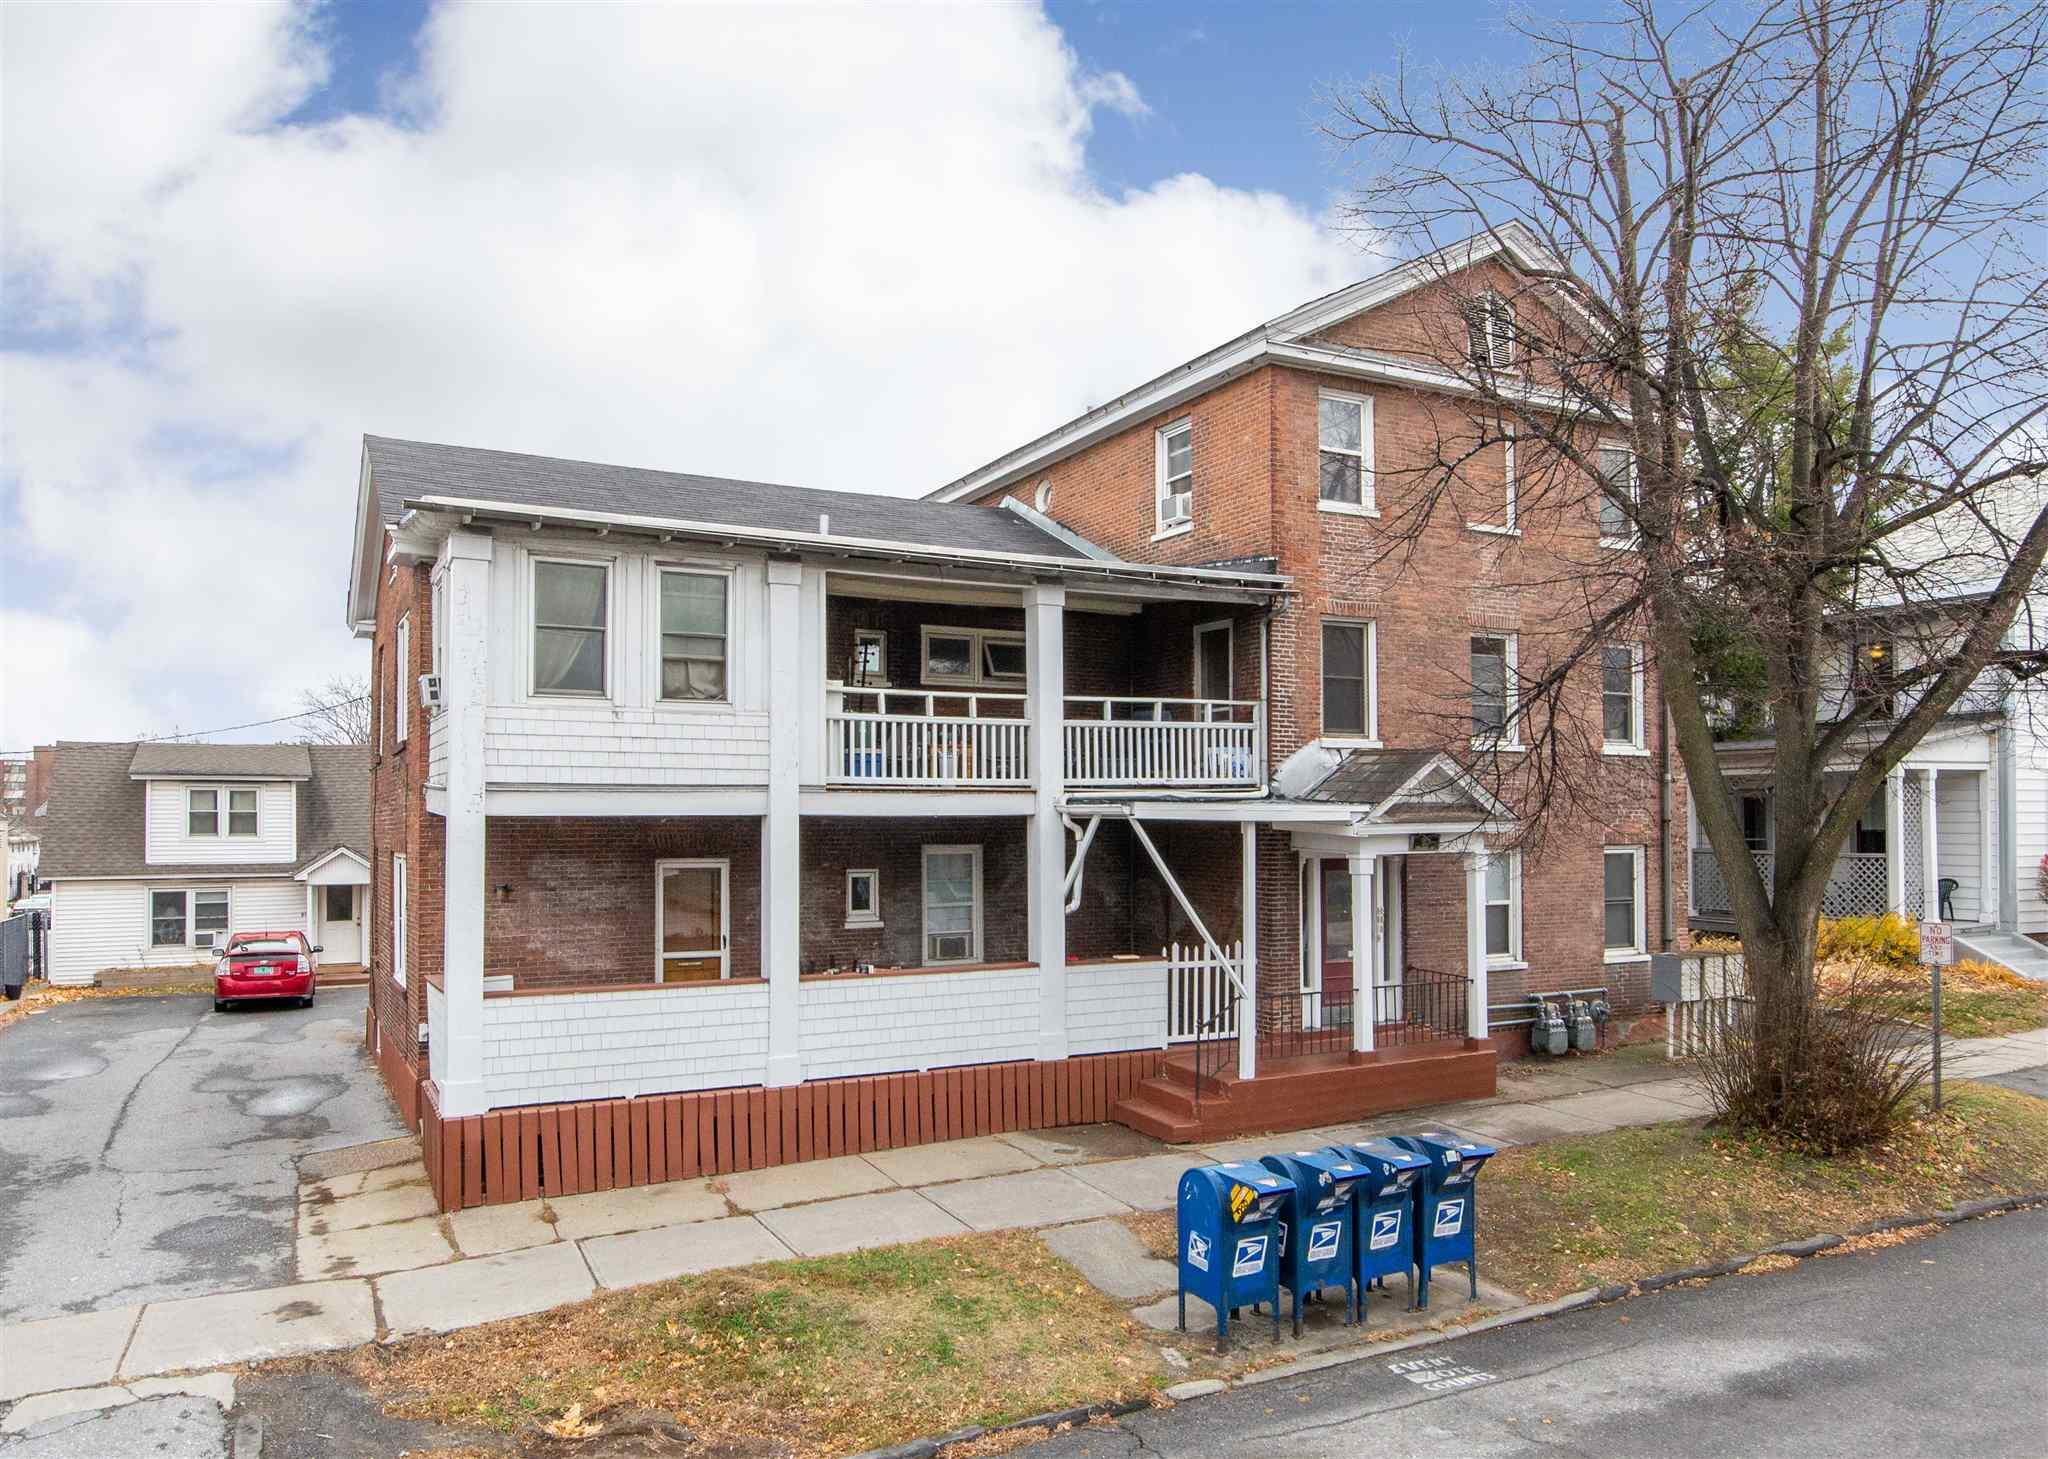 Photo of 21-25 Elmwood Avenue Burlington VT 05401